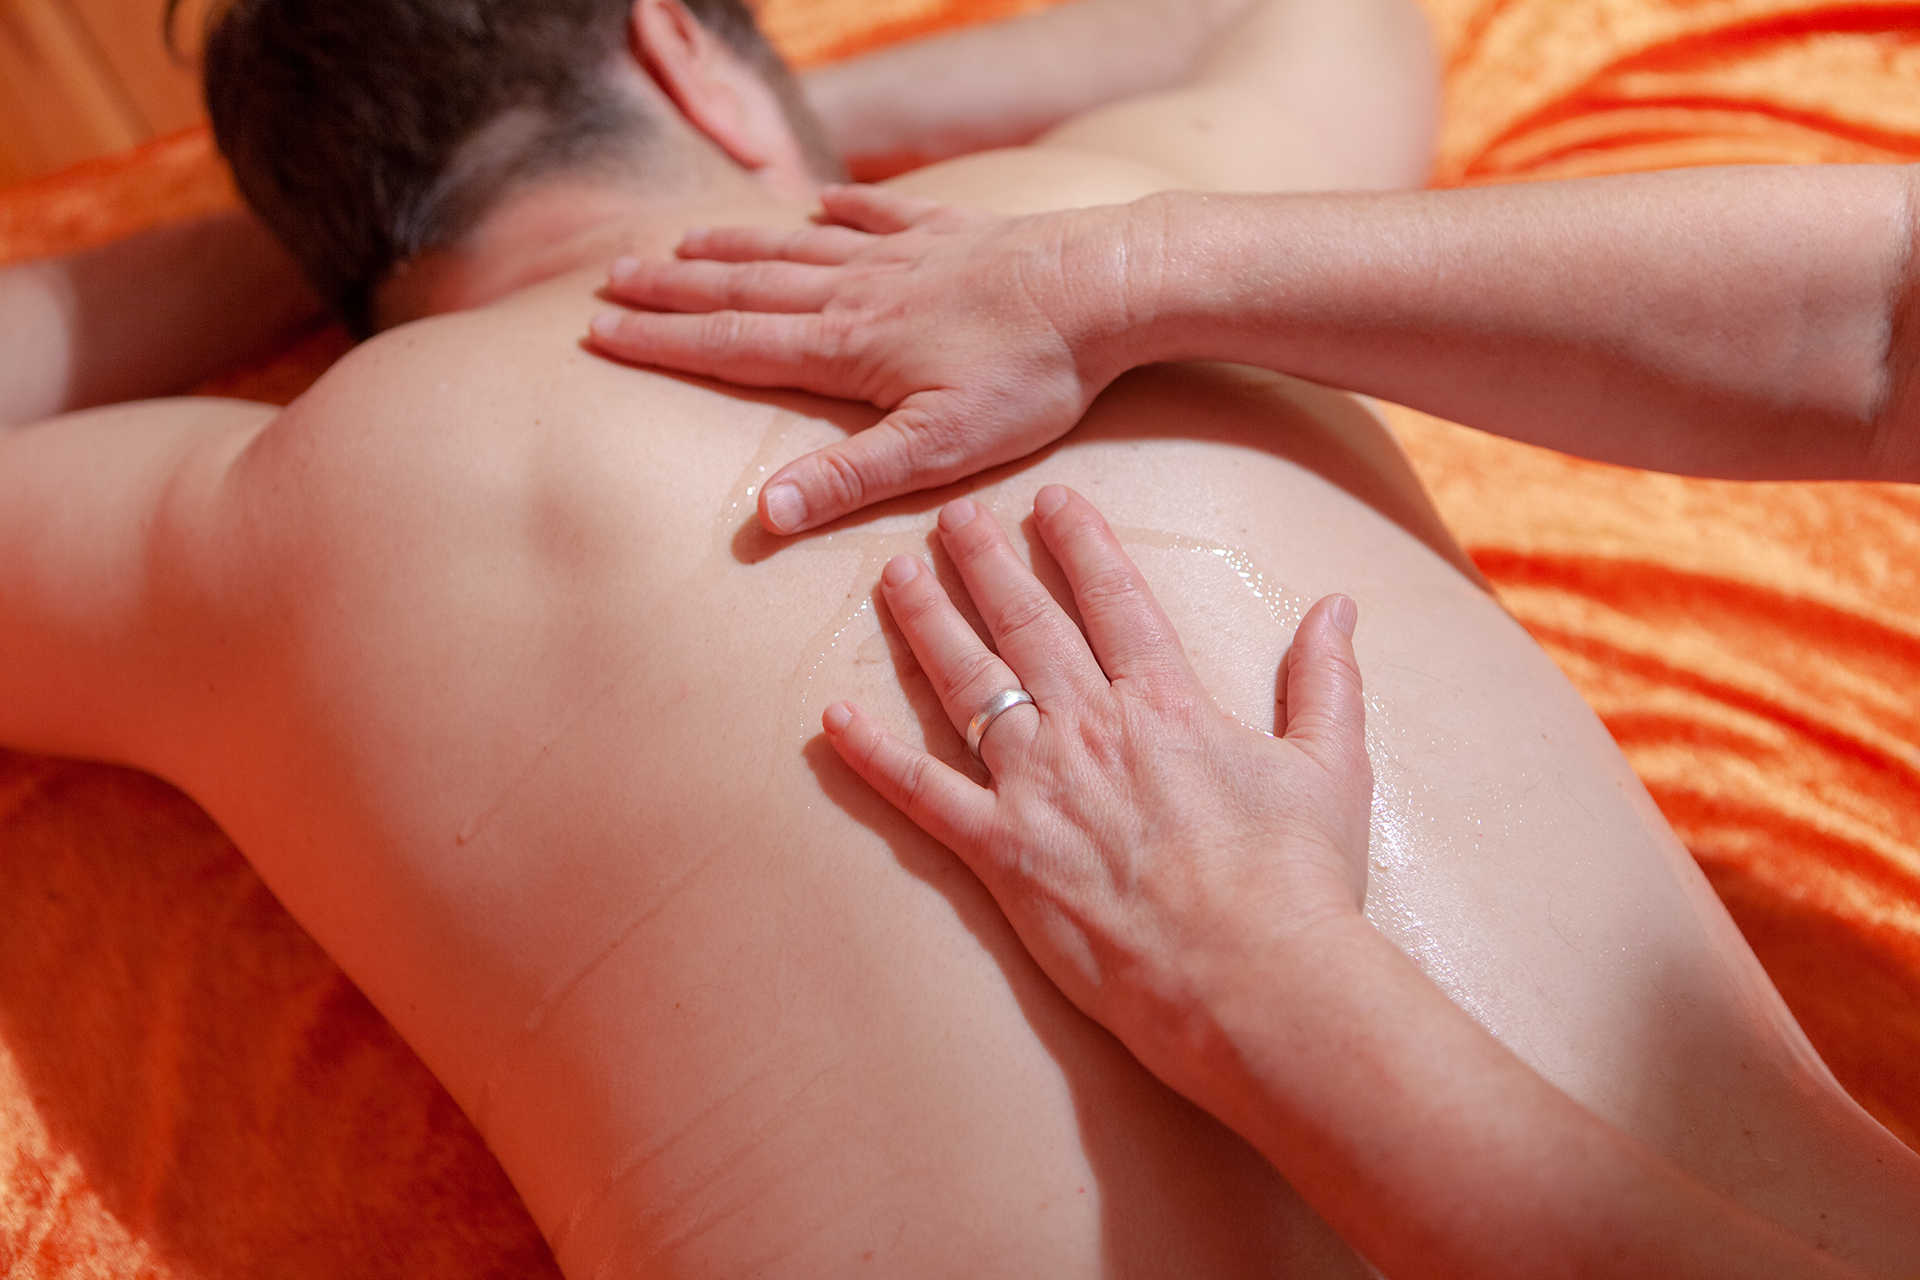 tandana-tantra-massage-ruecken-haende-oel-sinnlich-erotisch-berlin - Fotograf: Gregor Philipps • http://tetrachrome.de